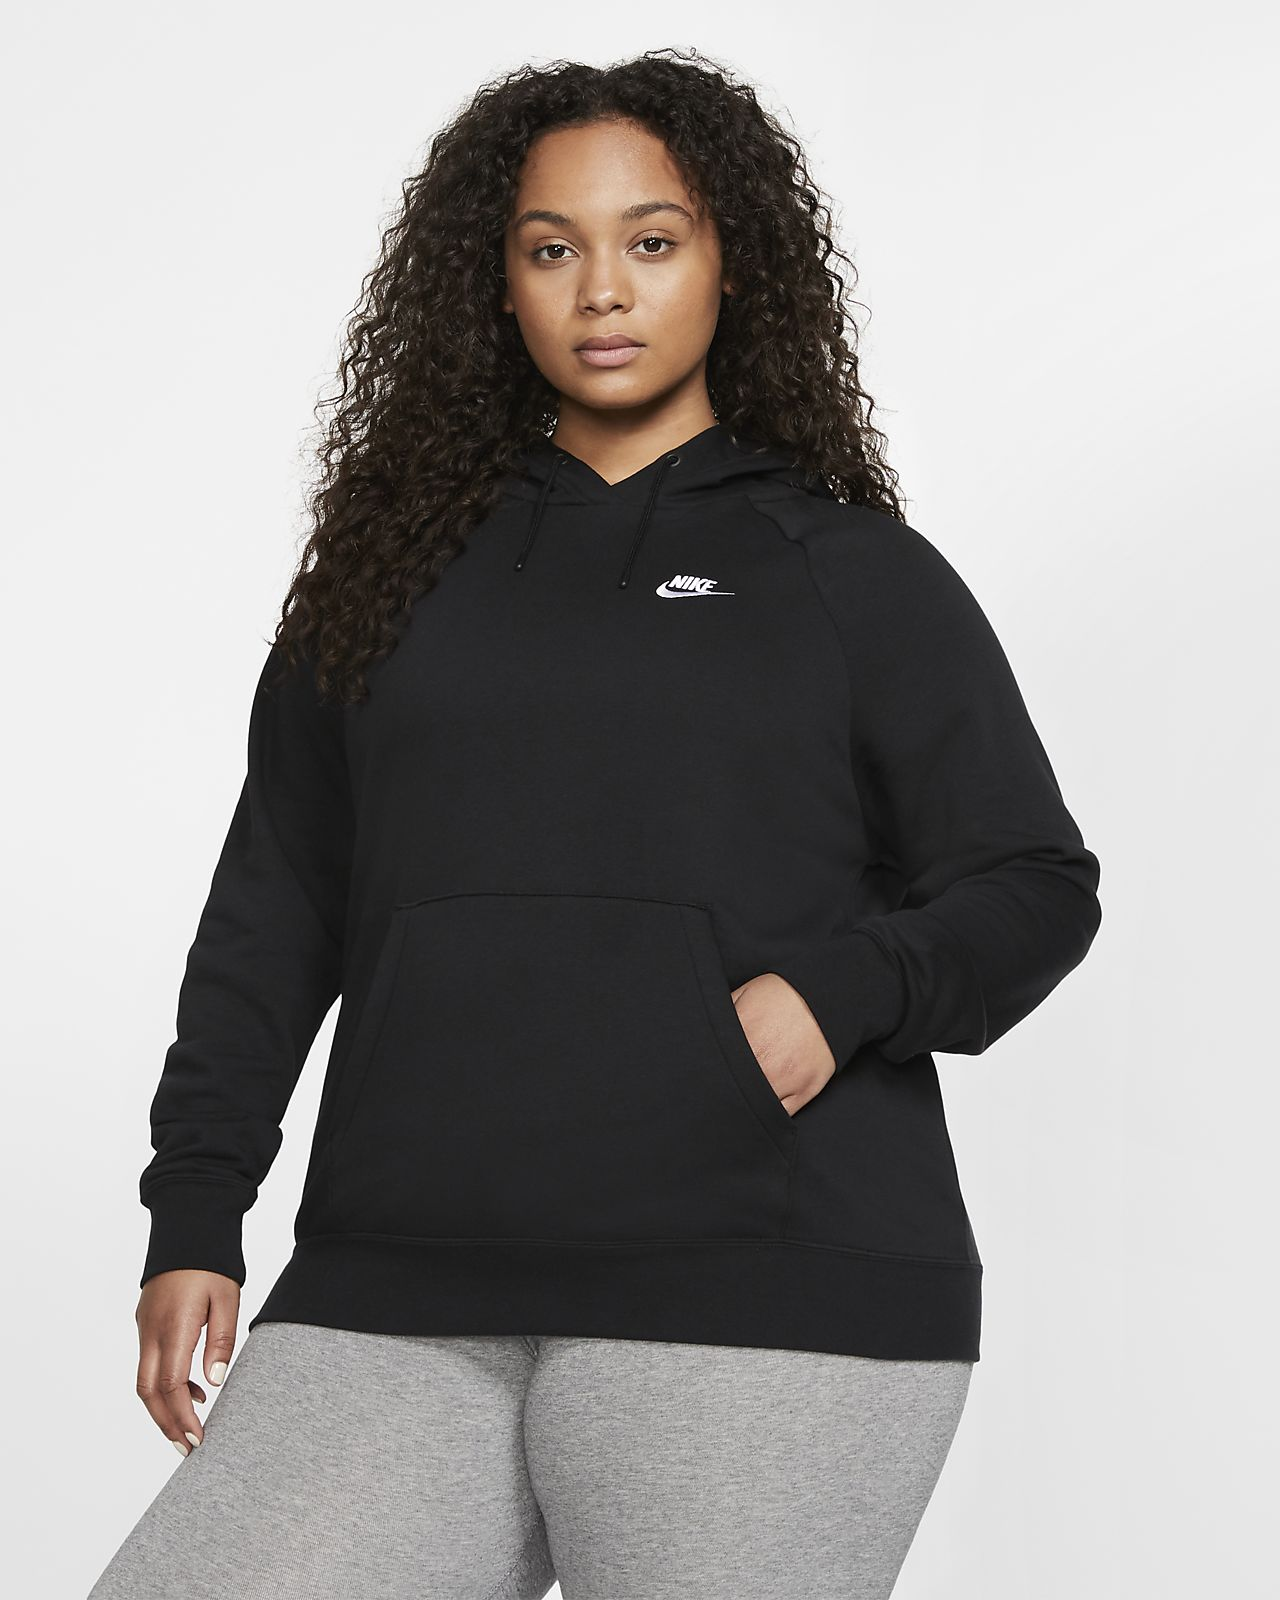 Nike Sportswear Essential Fleece Hoodie für Damen (große Größe)